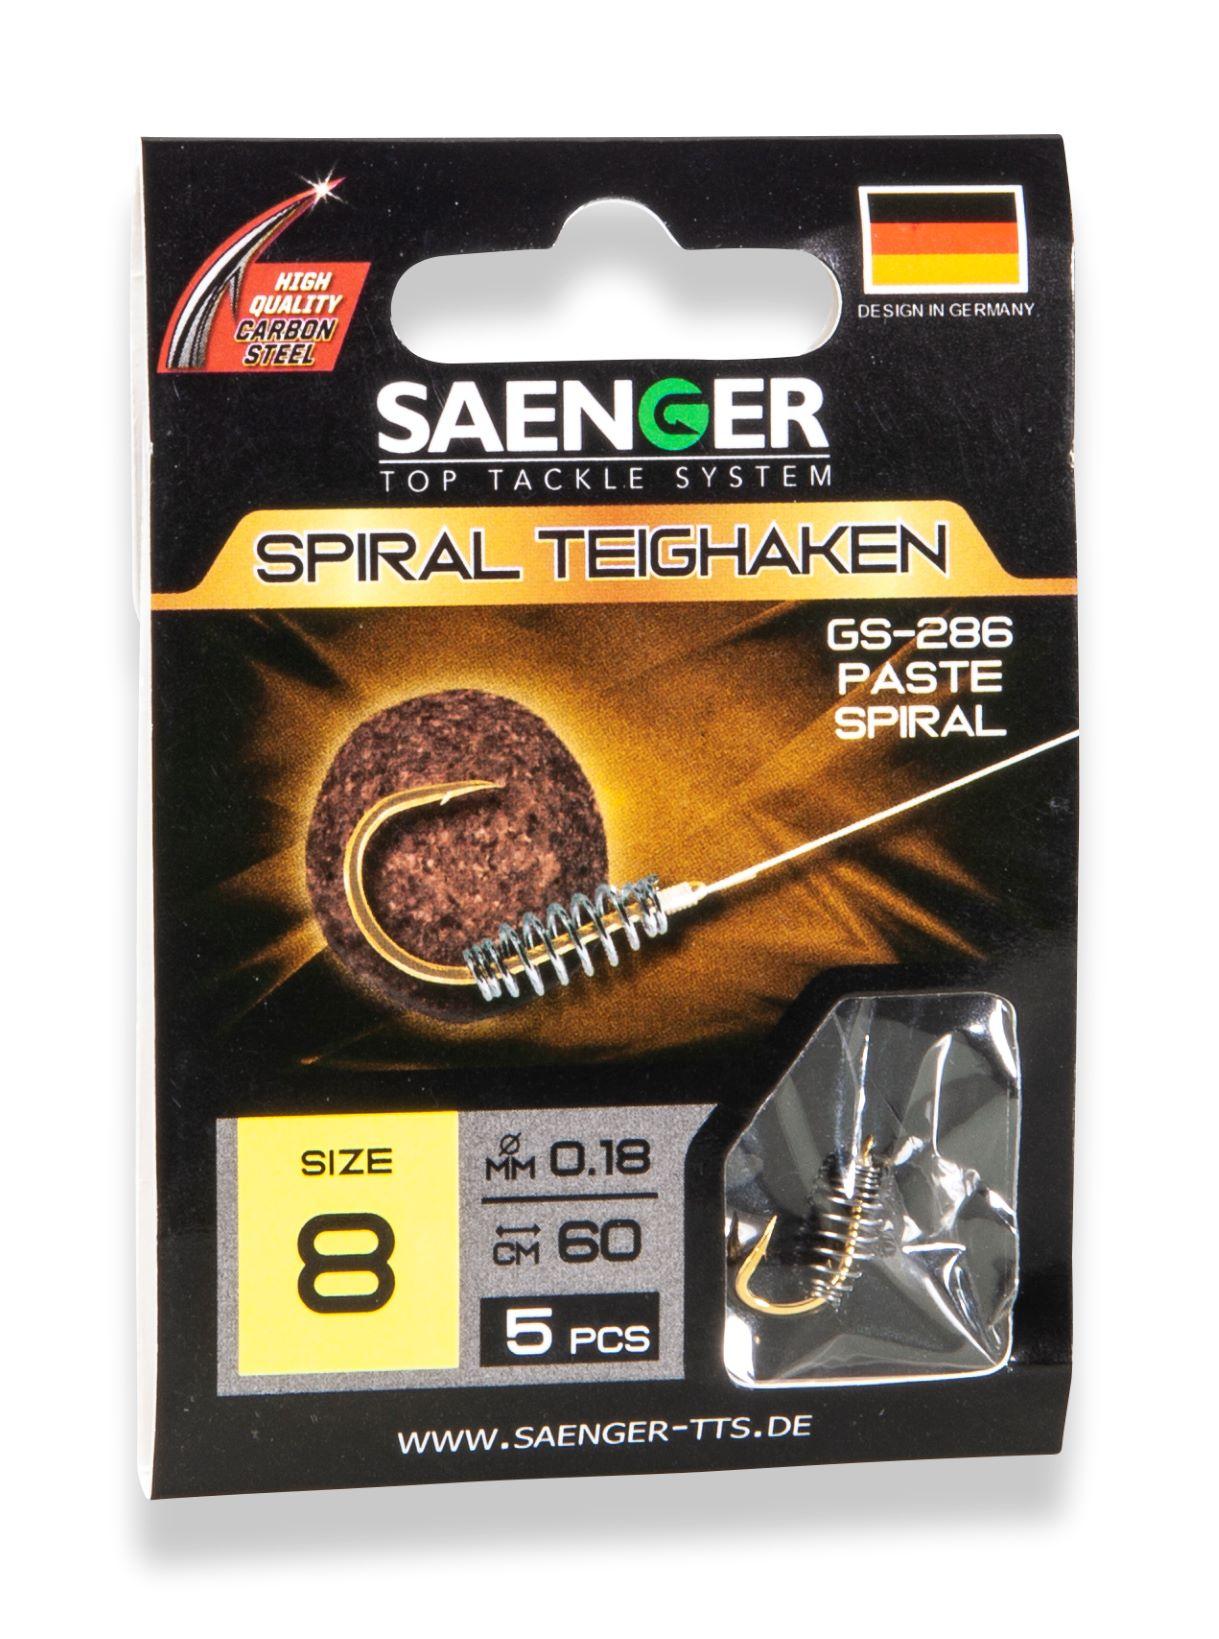 Saenger Návazec pro lov s těstem (háček se spirálou) Teighaken GS-286 vel. 2, 5 ks/bal